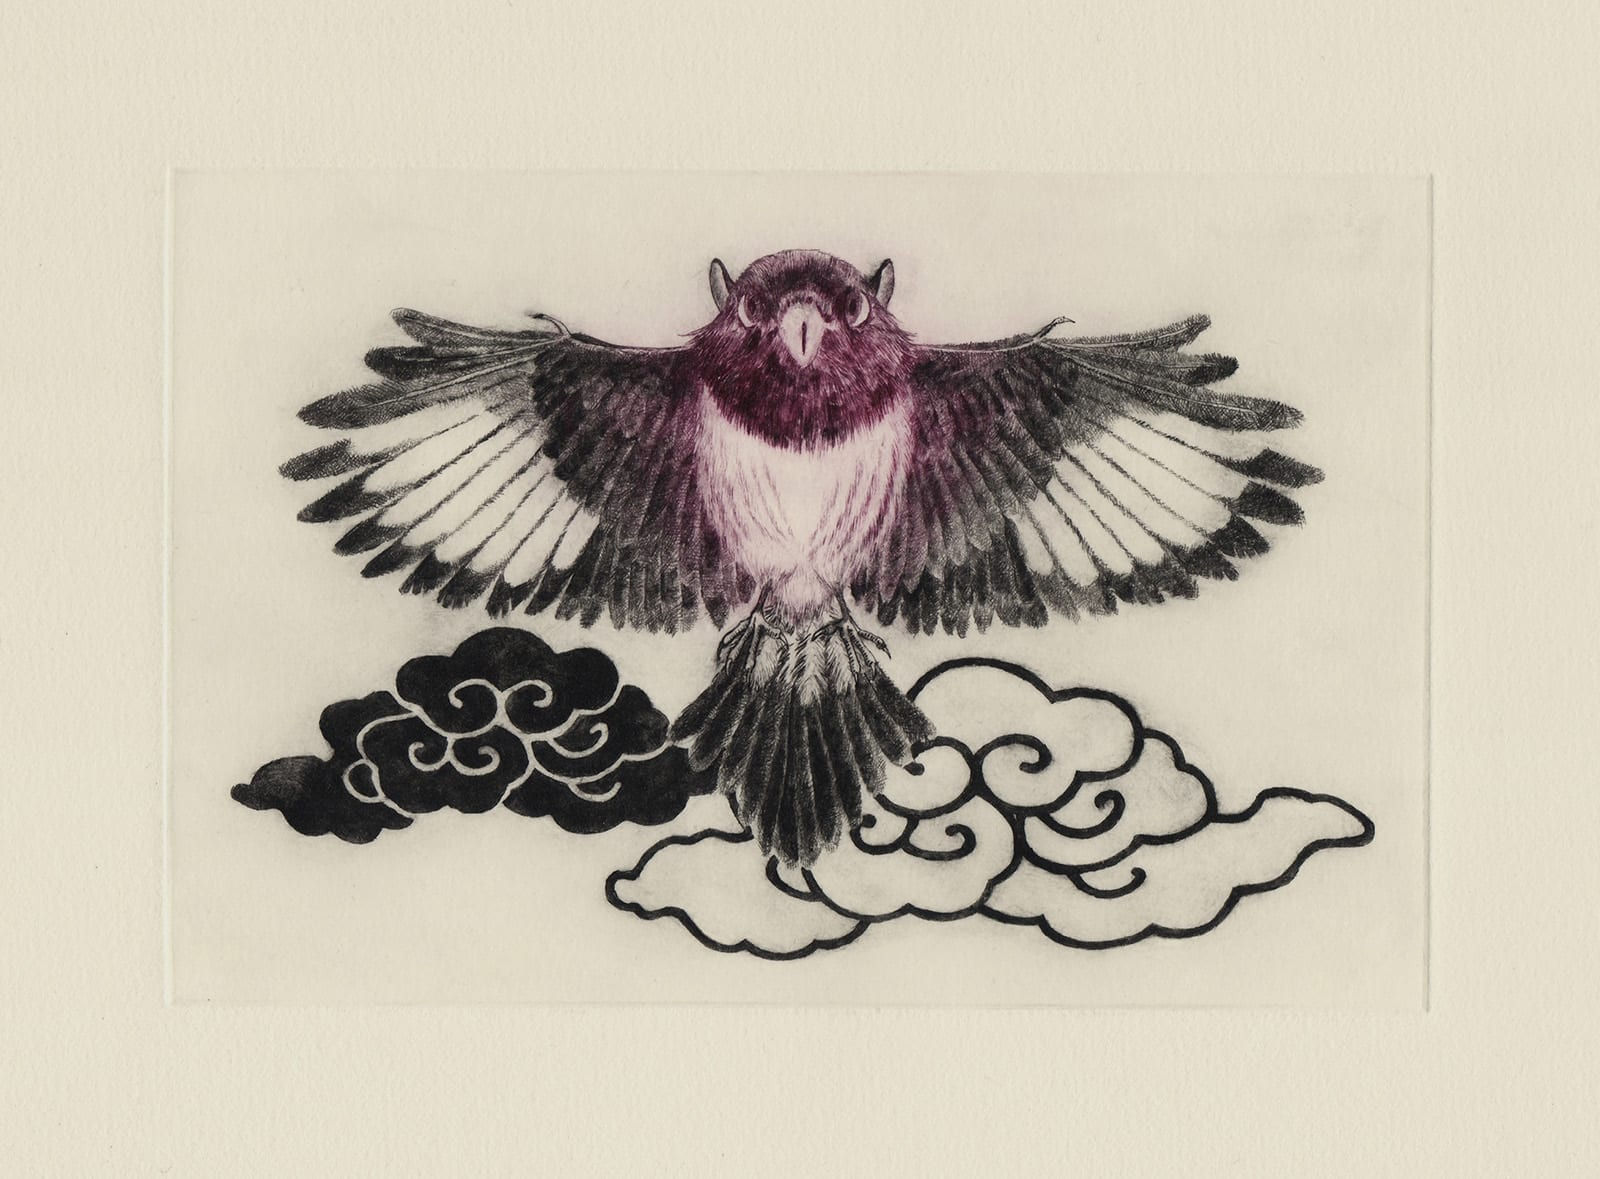 Hizen no Kuni no Icho (drypoint etching by Yaemi Shigyo)